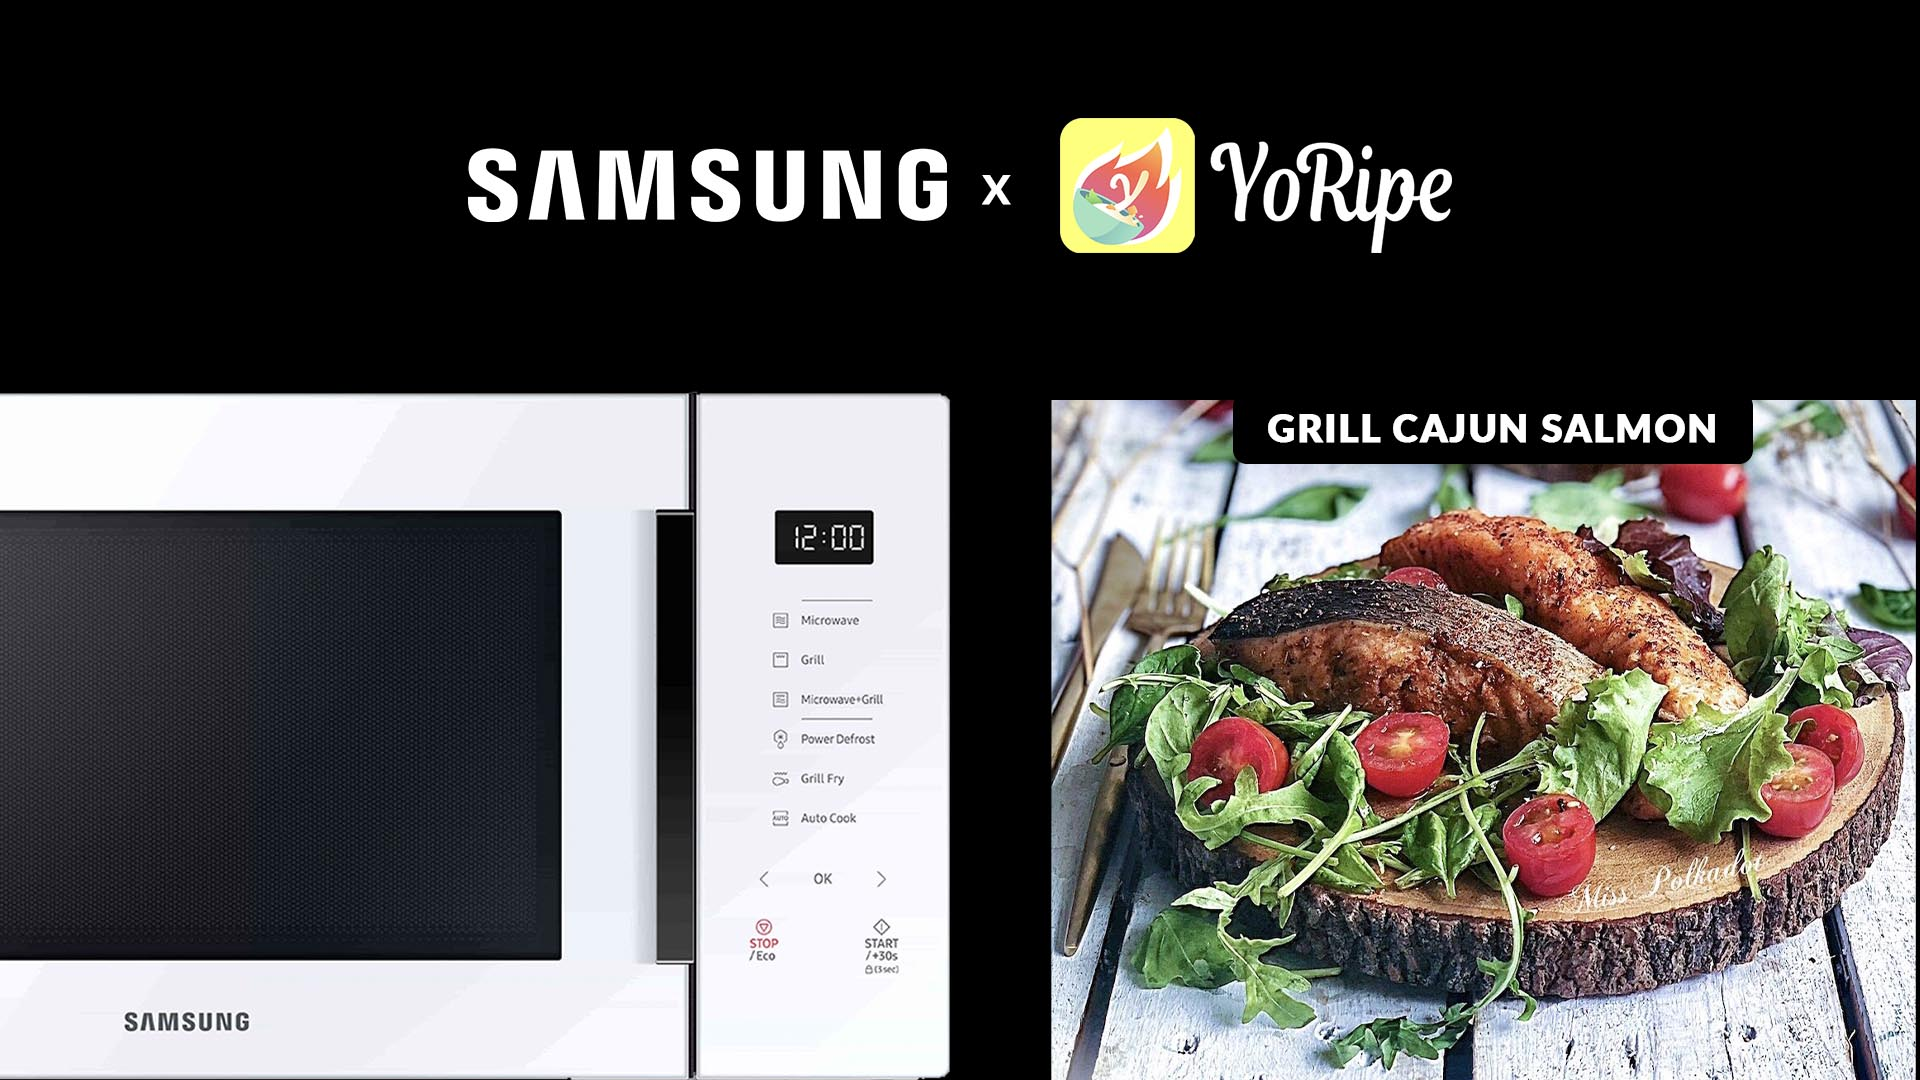 Samsung x YoRipe